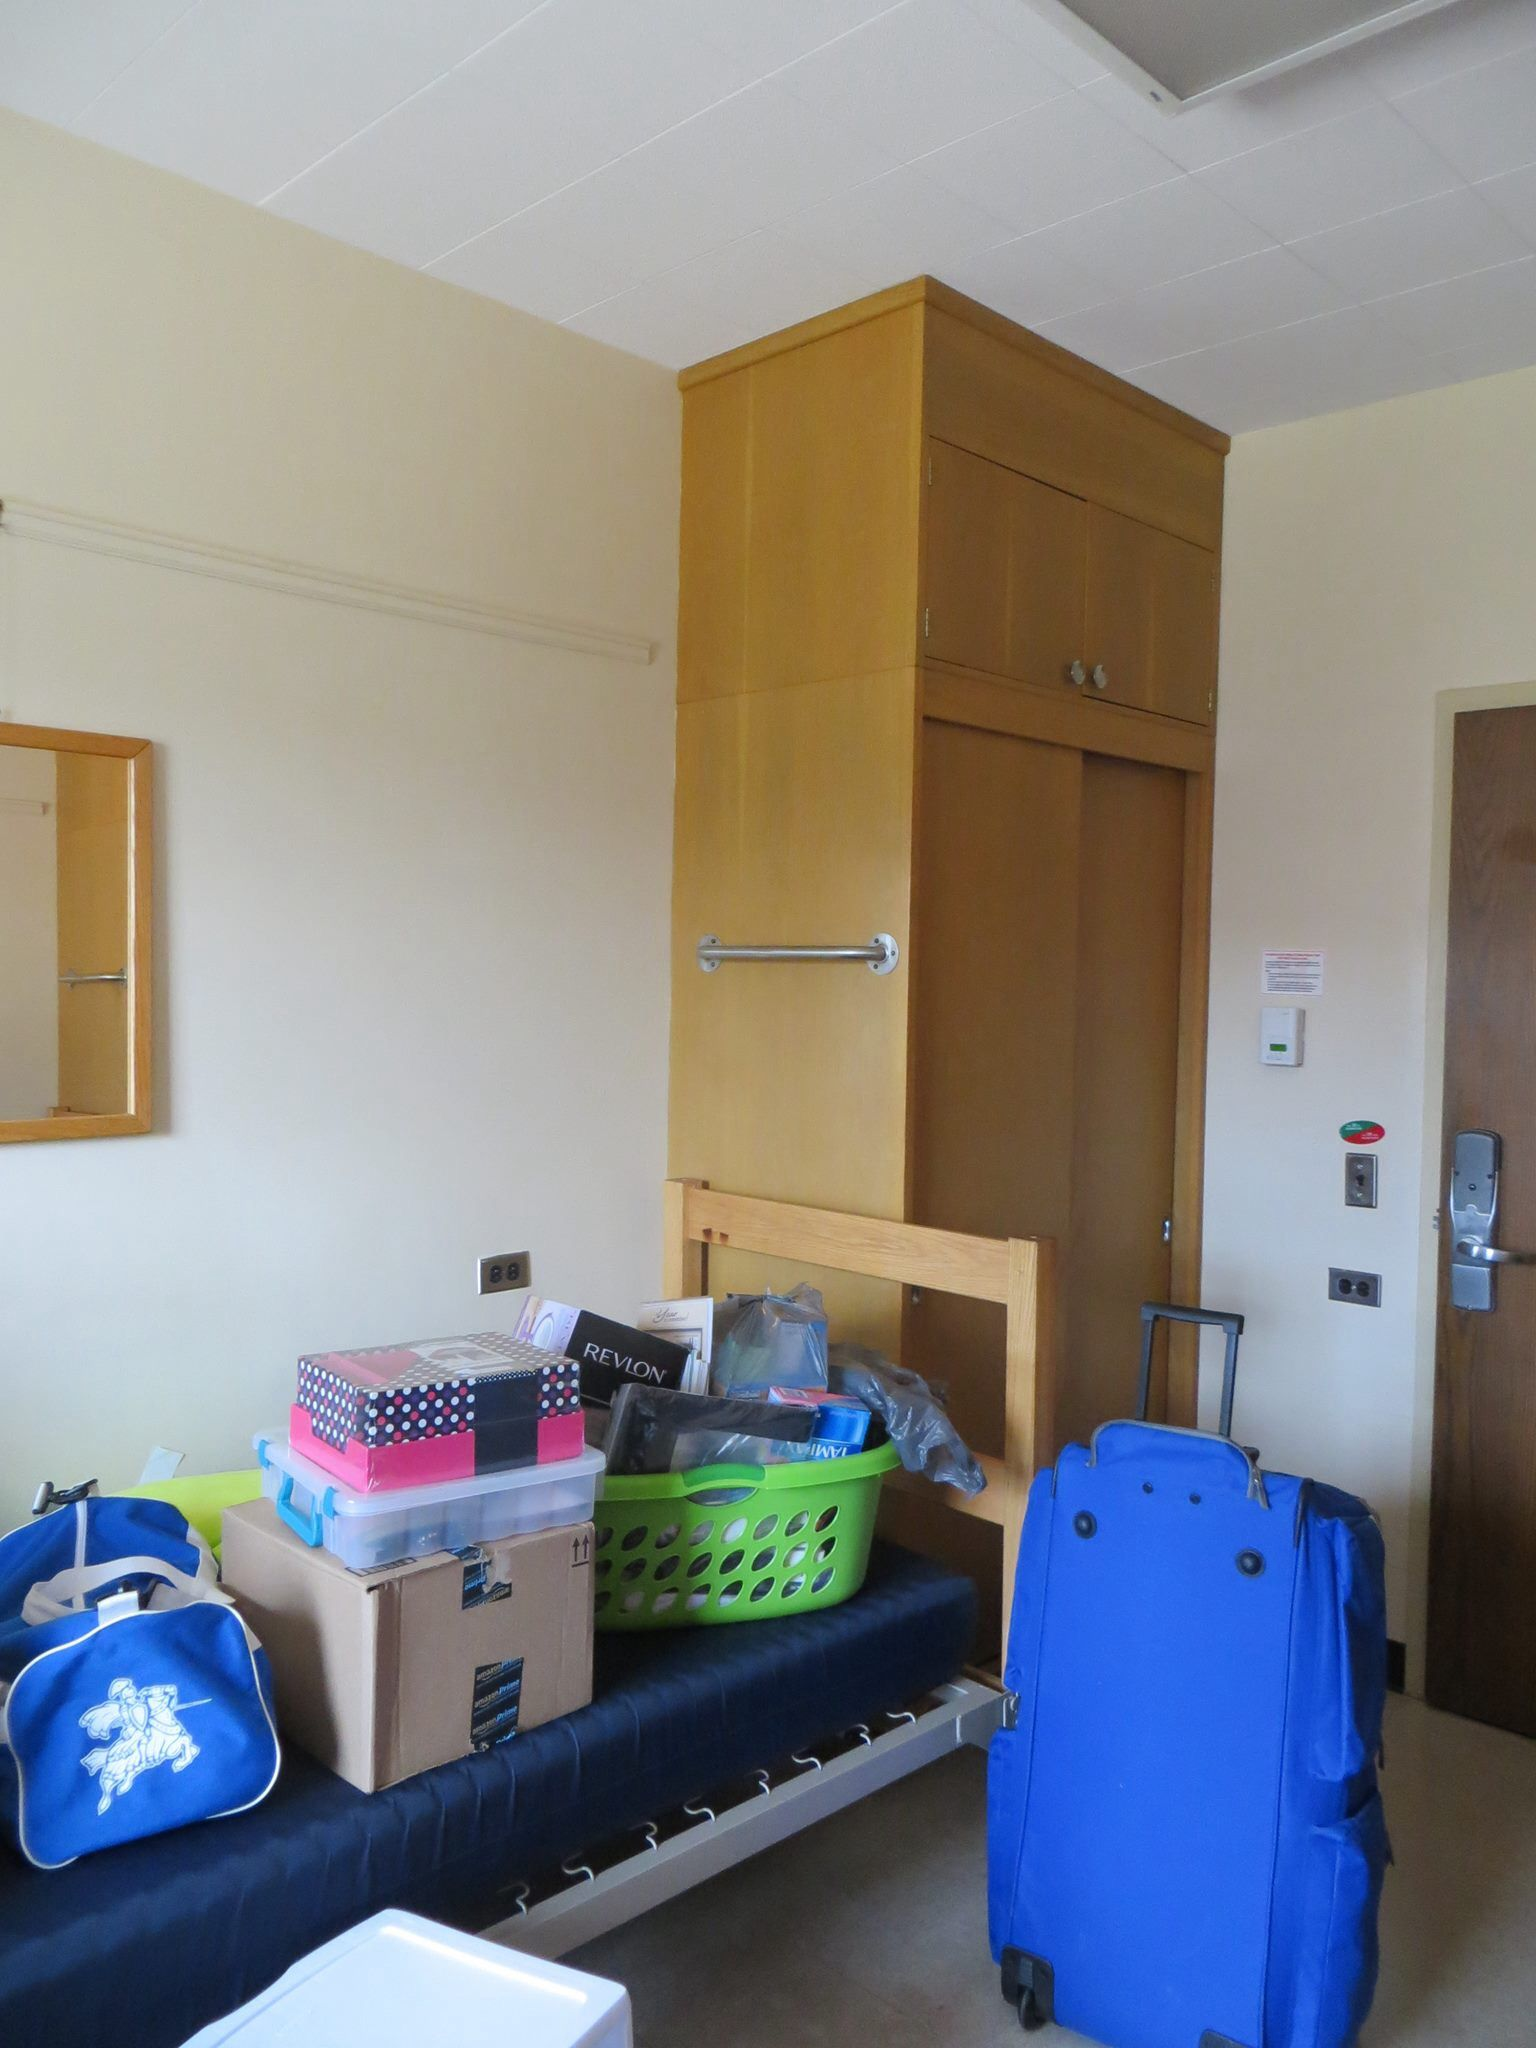 Dorm Room Furniture: Havinburst Hall Furniture